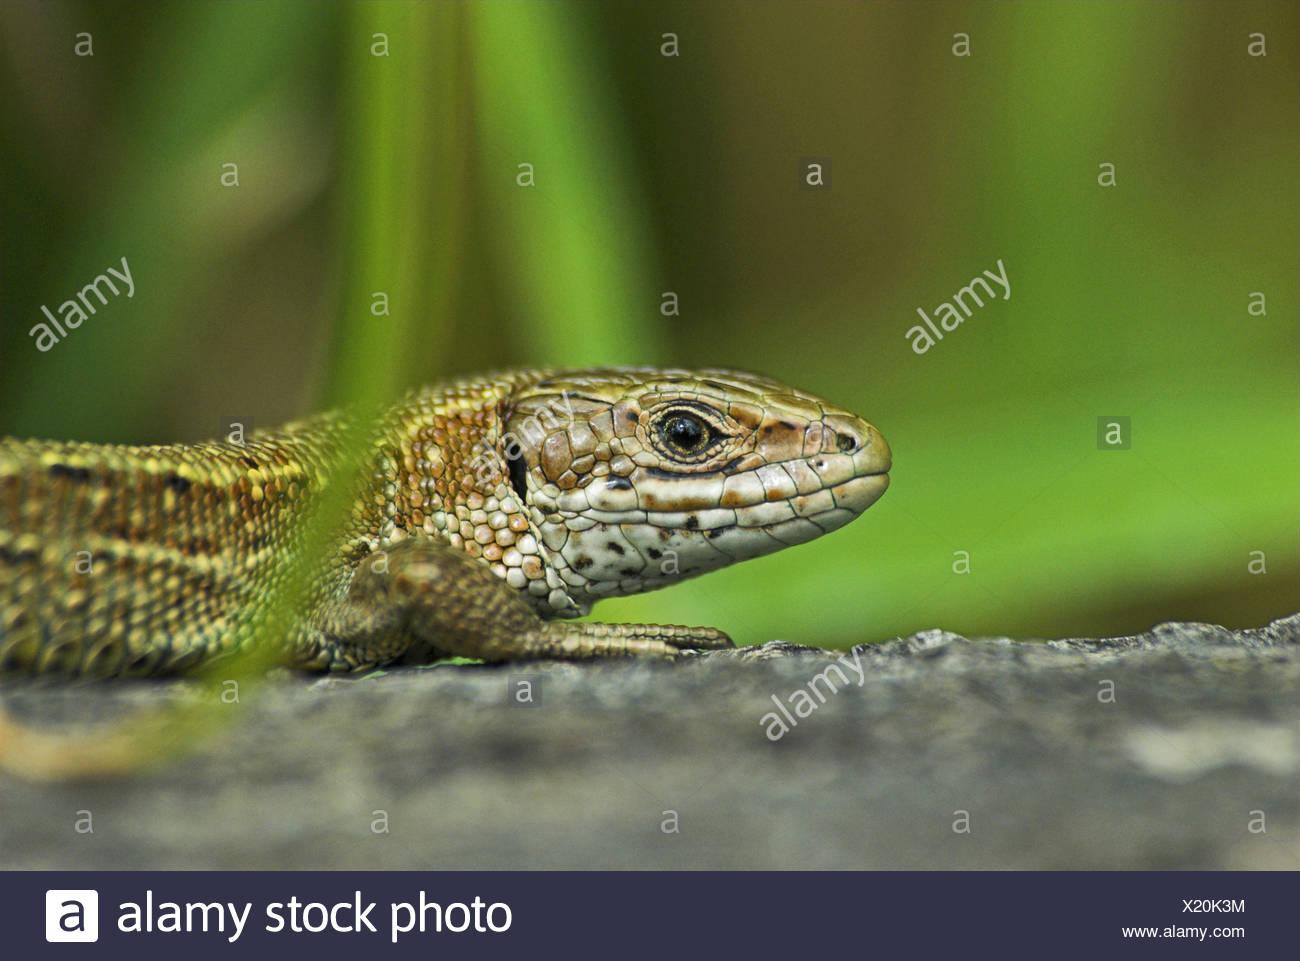 Peregrino lagartija común (Lacerta vivipara). Foto de stock